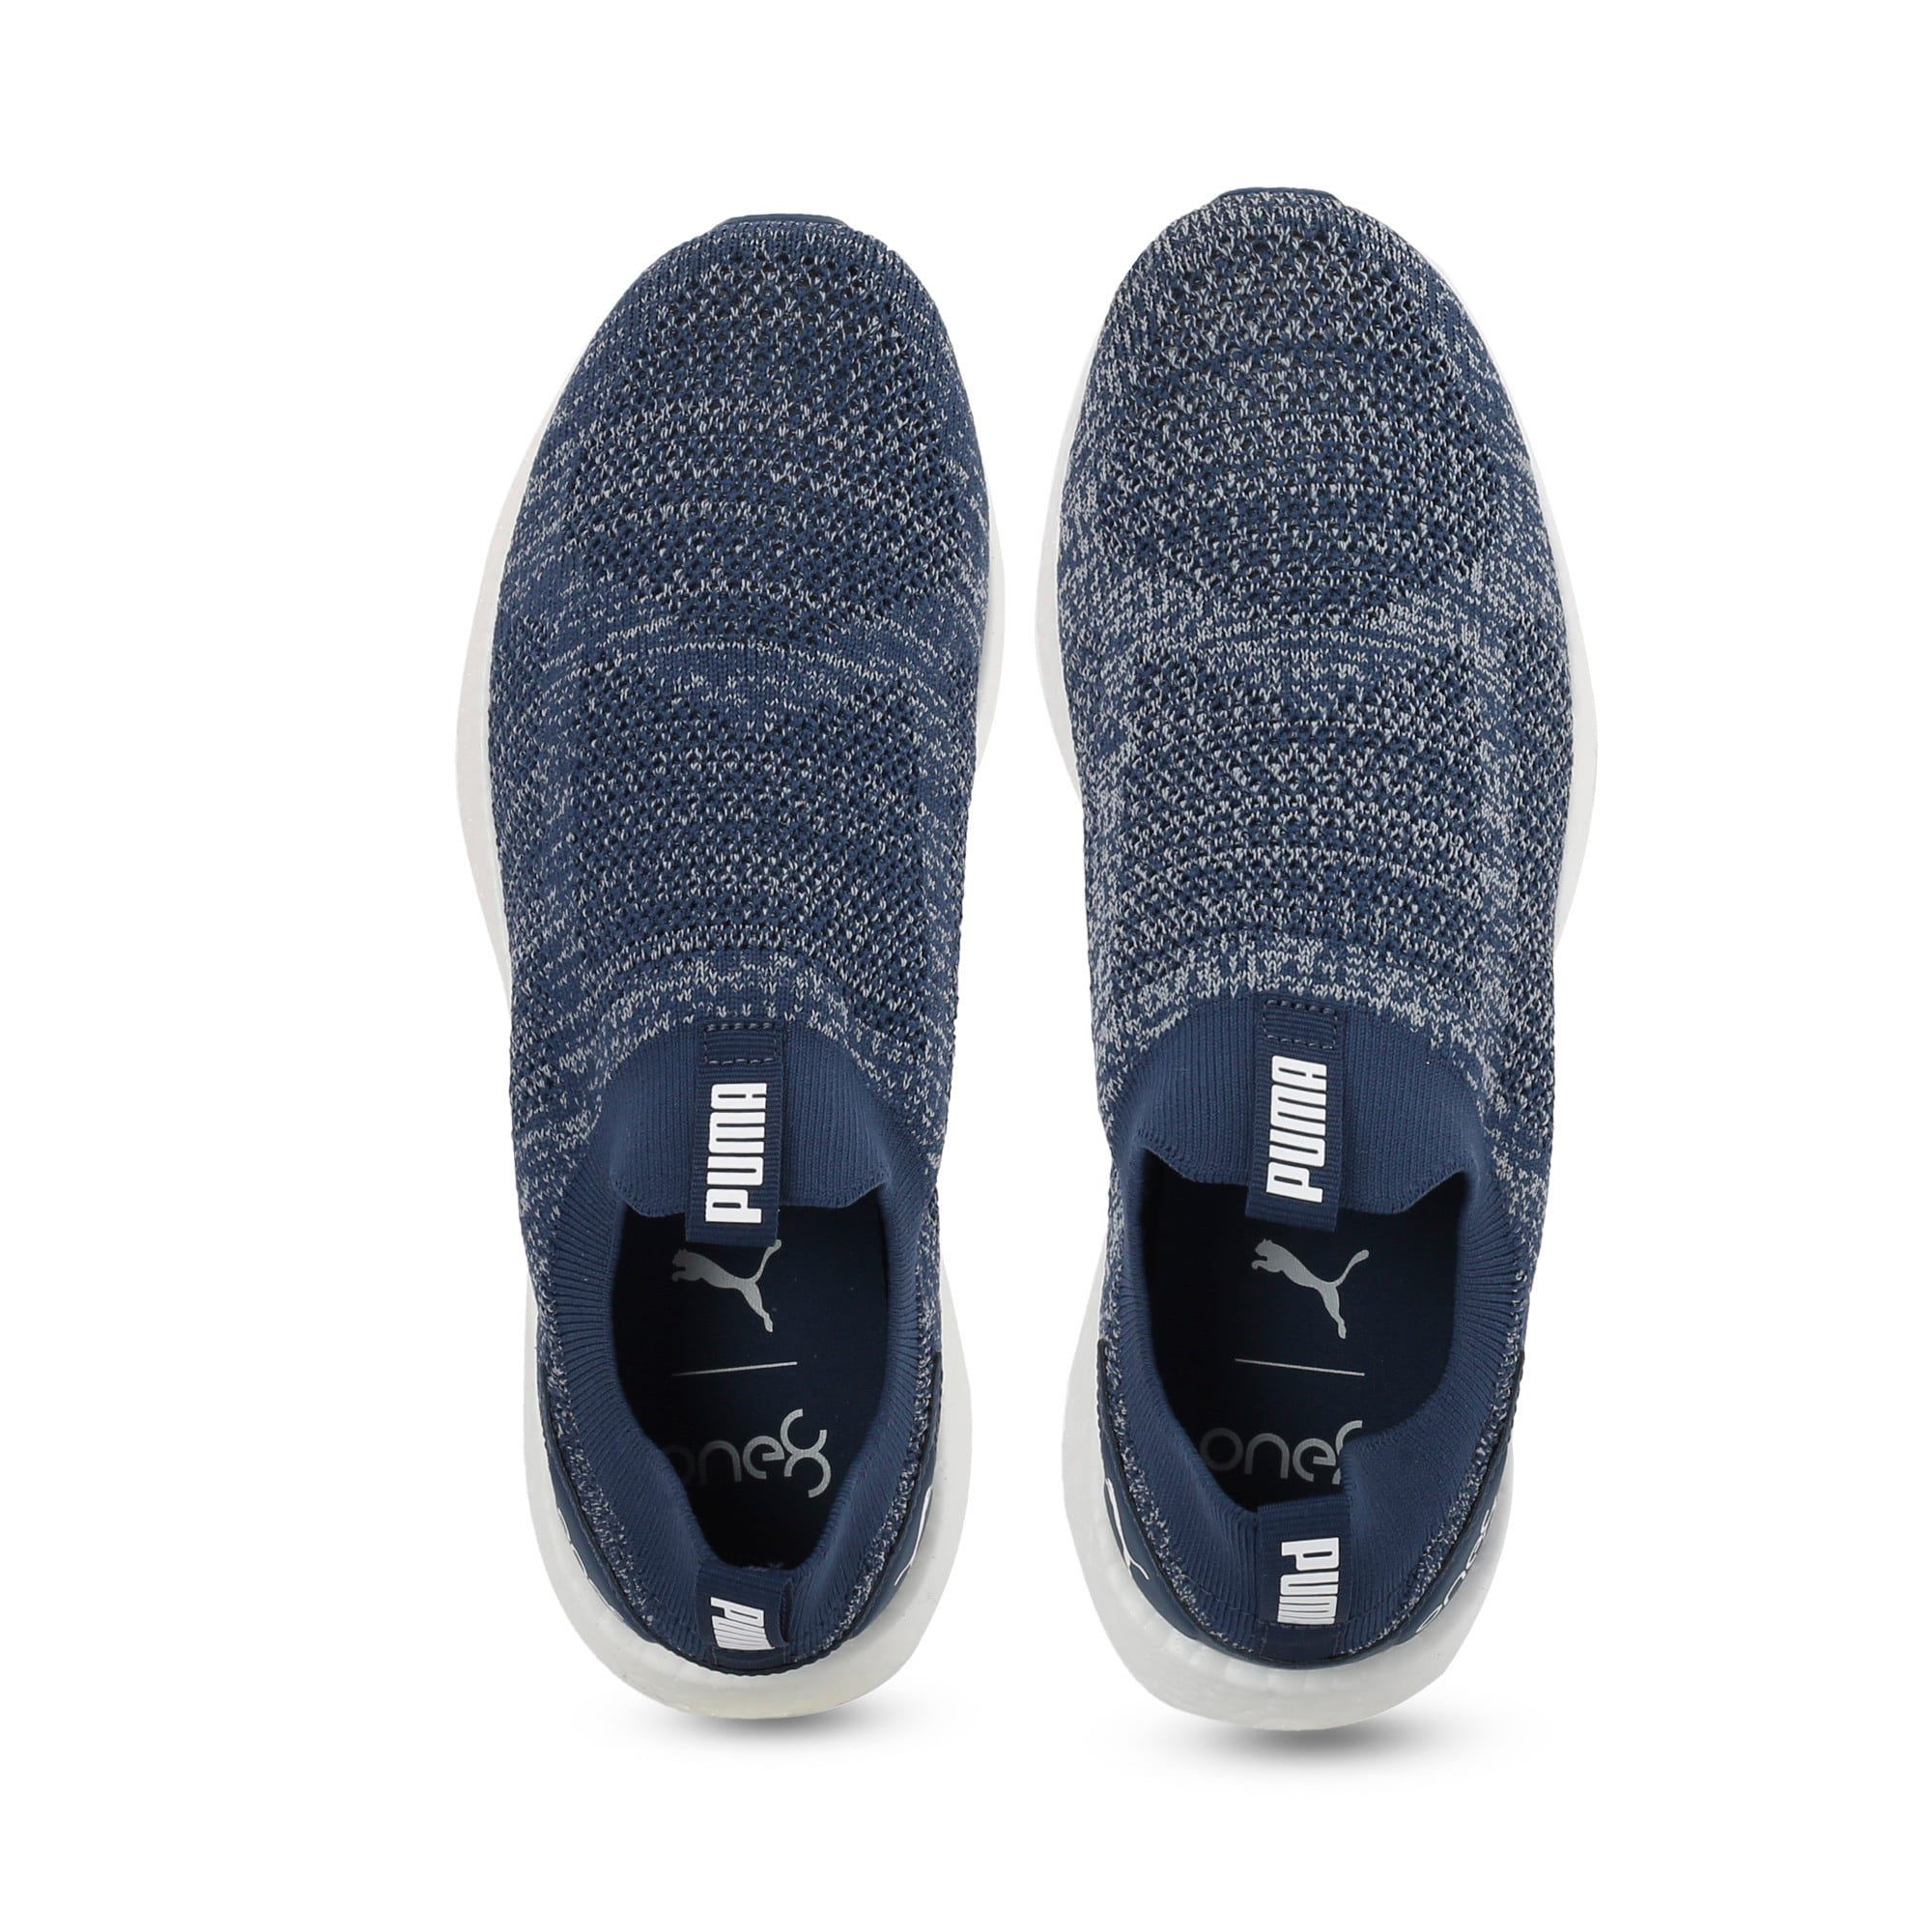 Thumbnail 6 of NRGY Neko Slip-On one8 Unisex Running Shoes, Dark Denim-Puma White, medium-IND